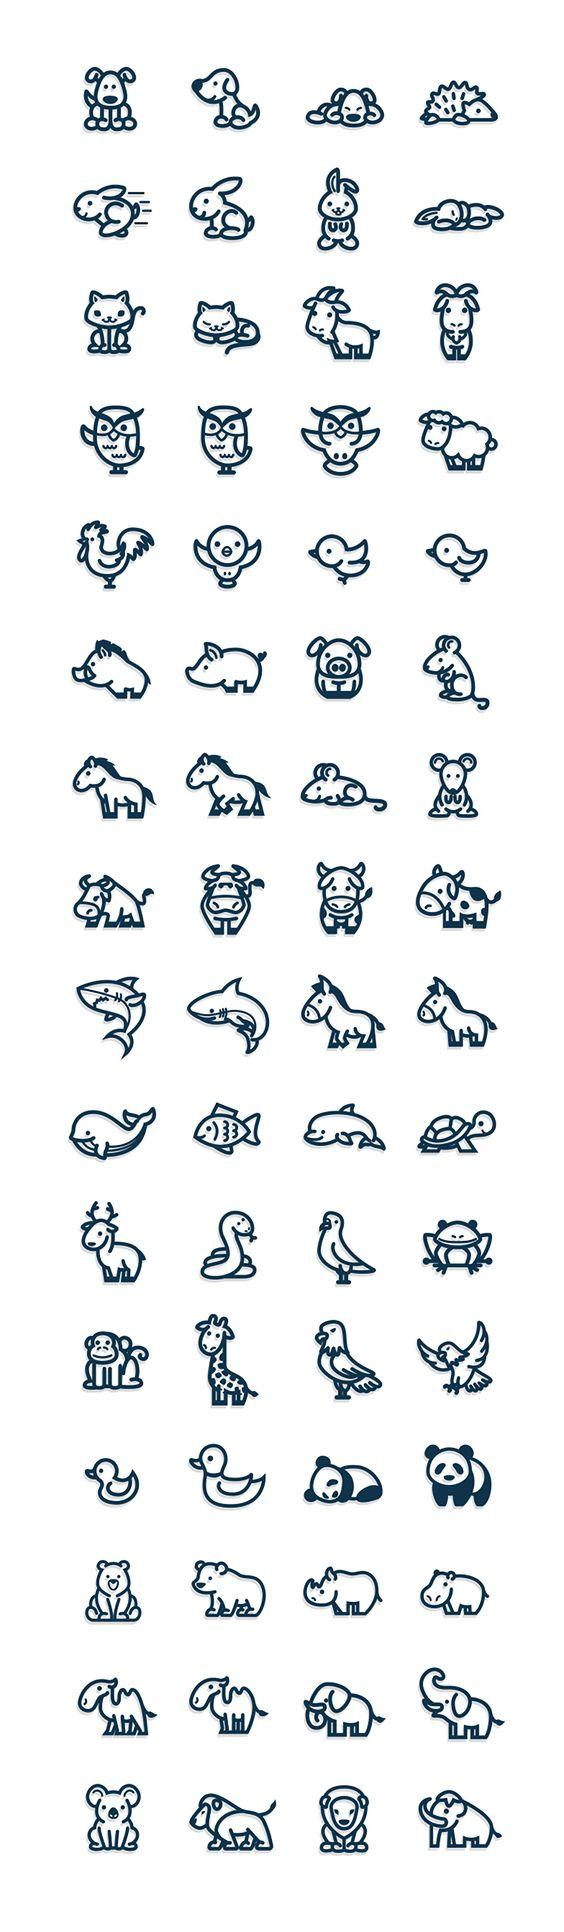 Animal icons on Behance